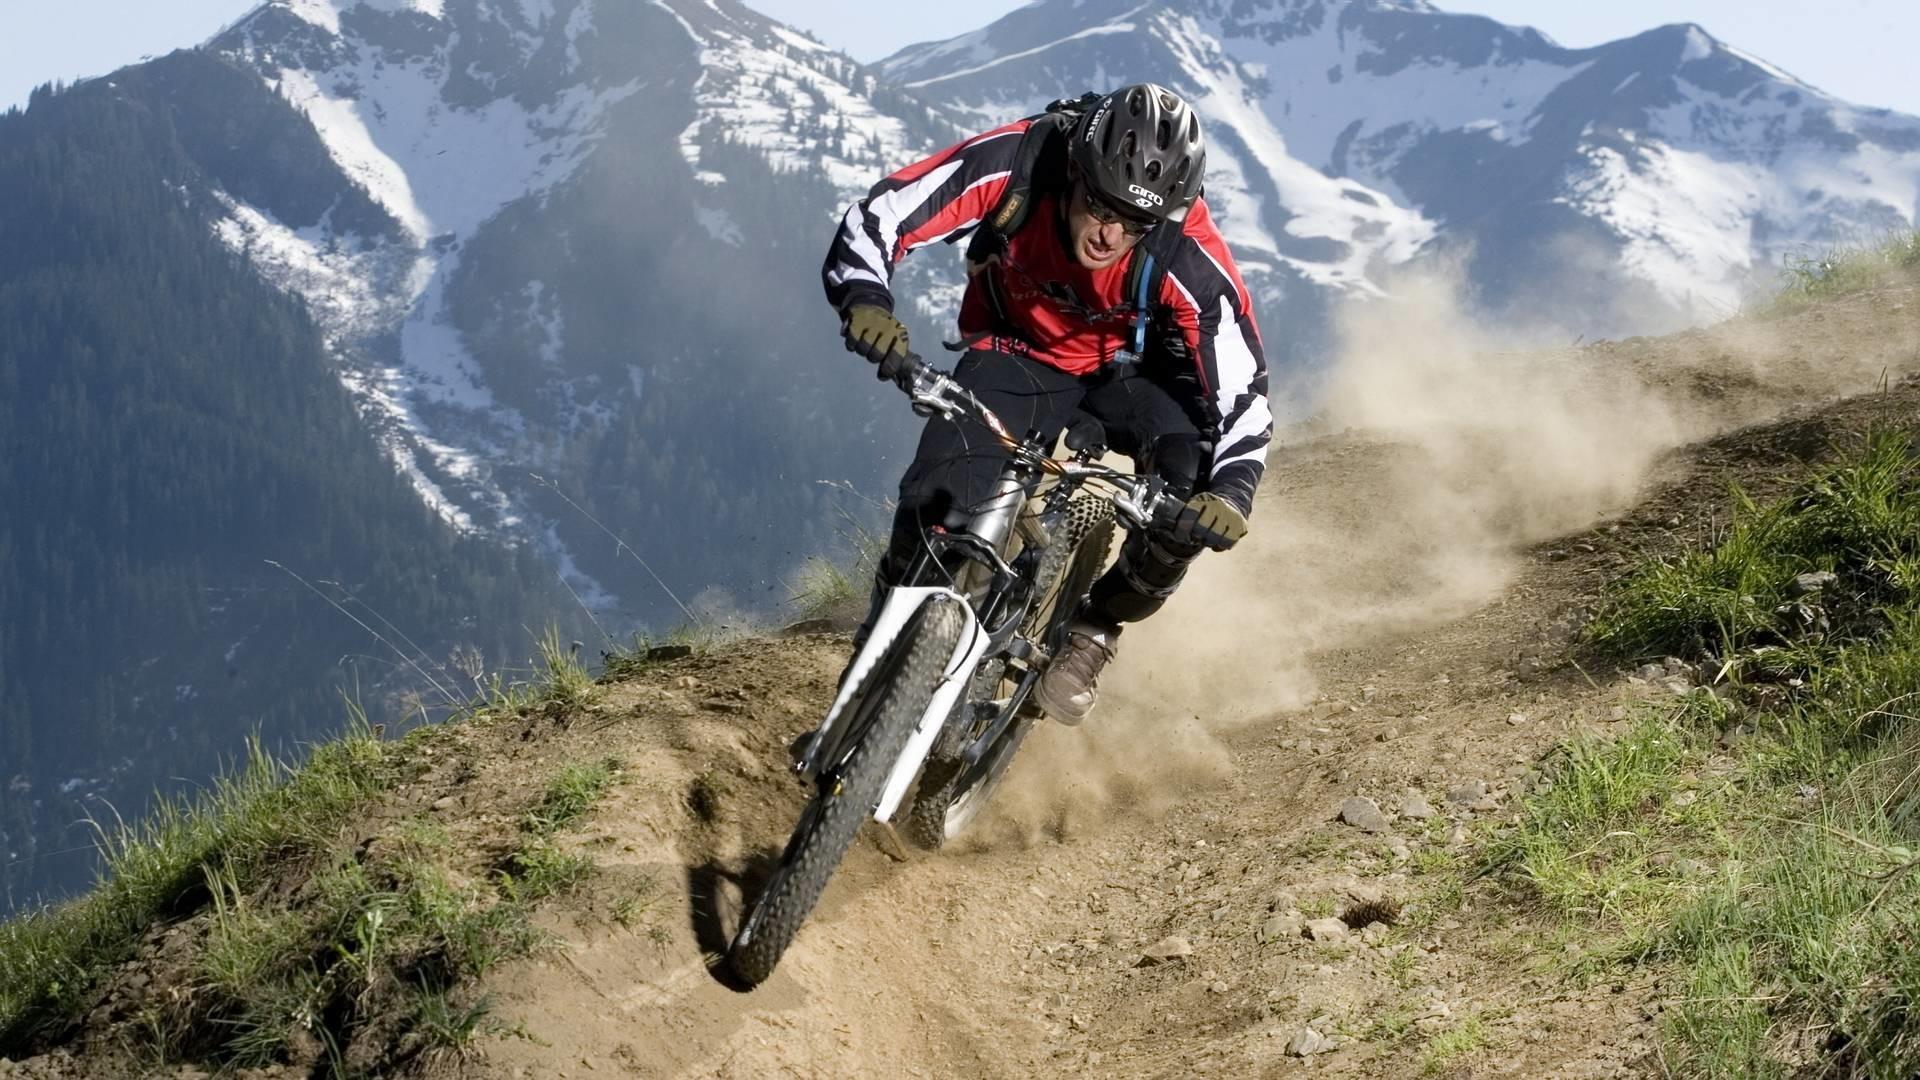 Downhill Mountain Bike Wallpaper Wallpapertag